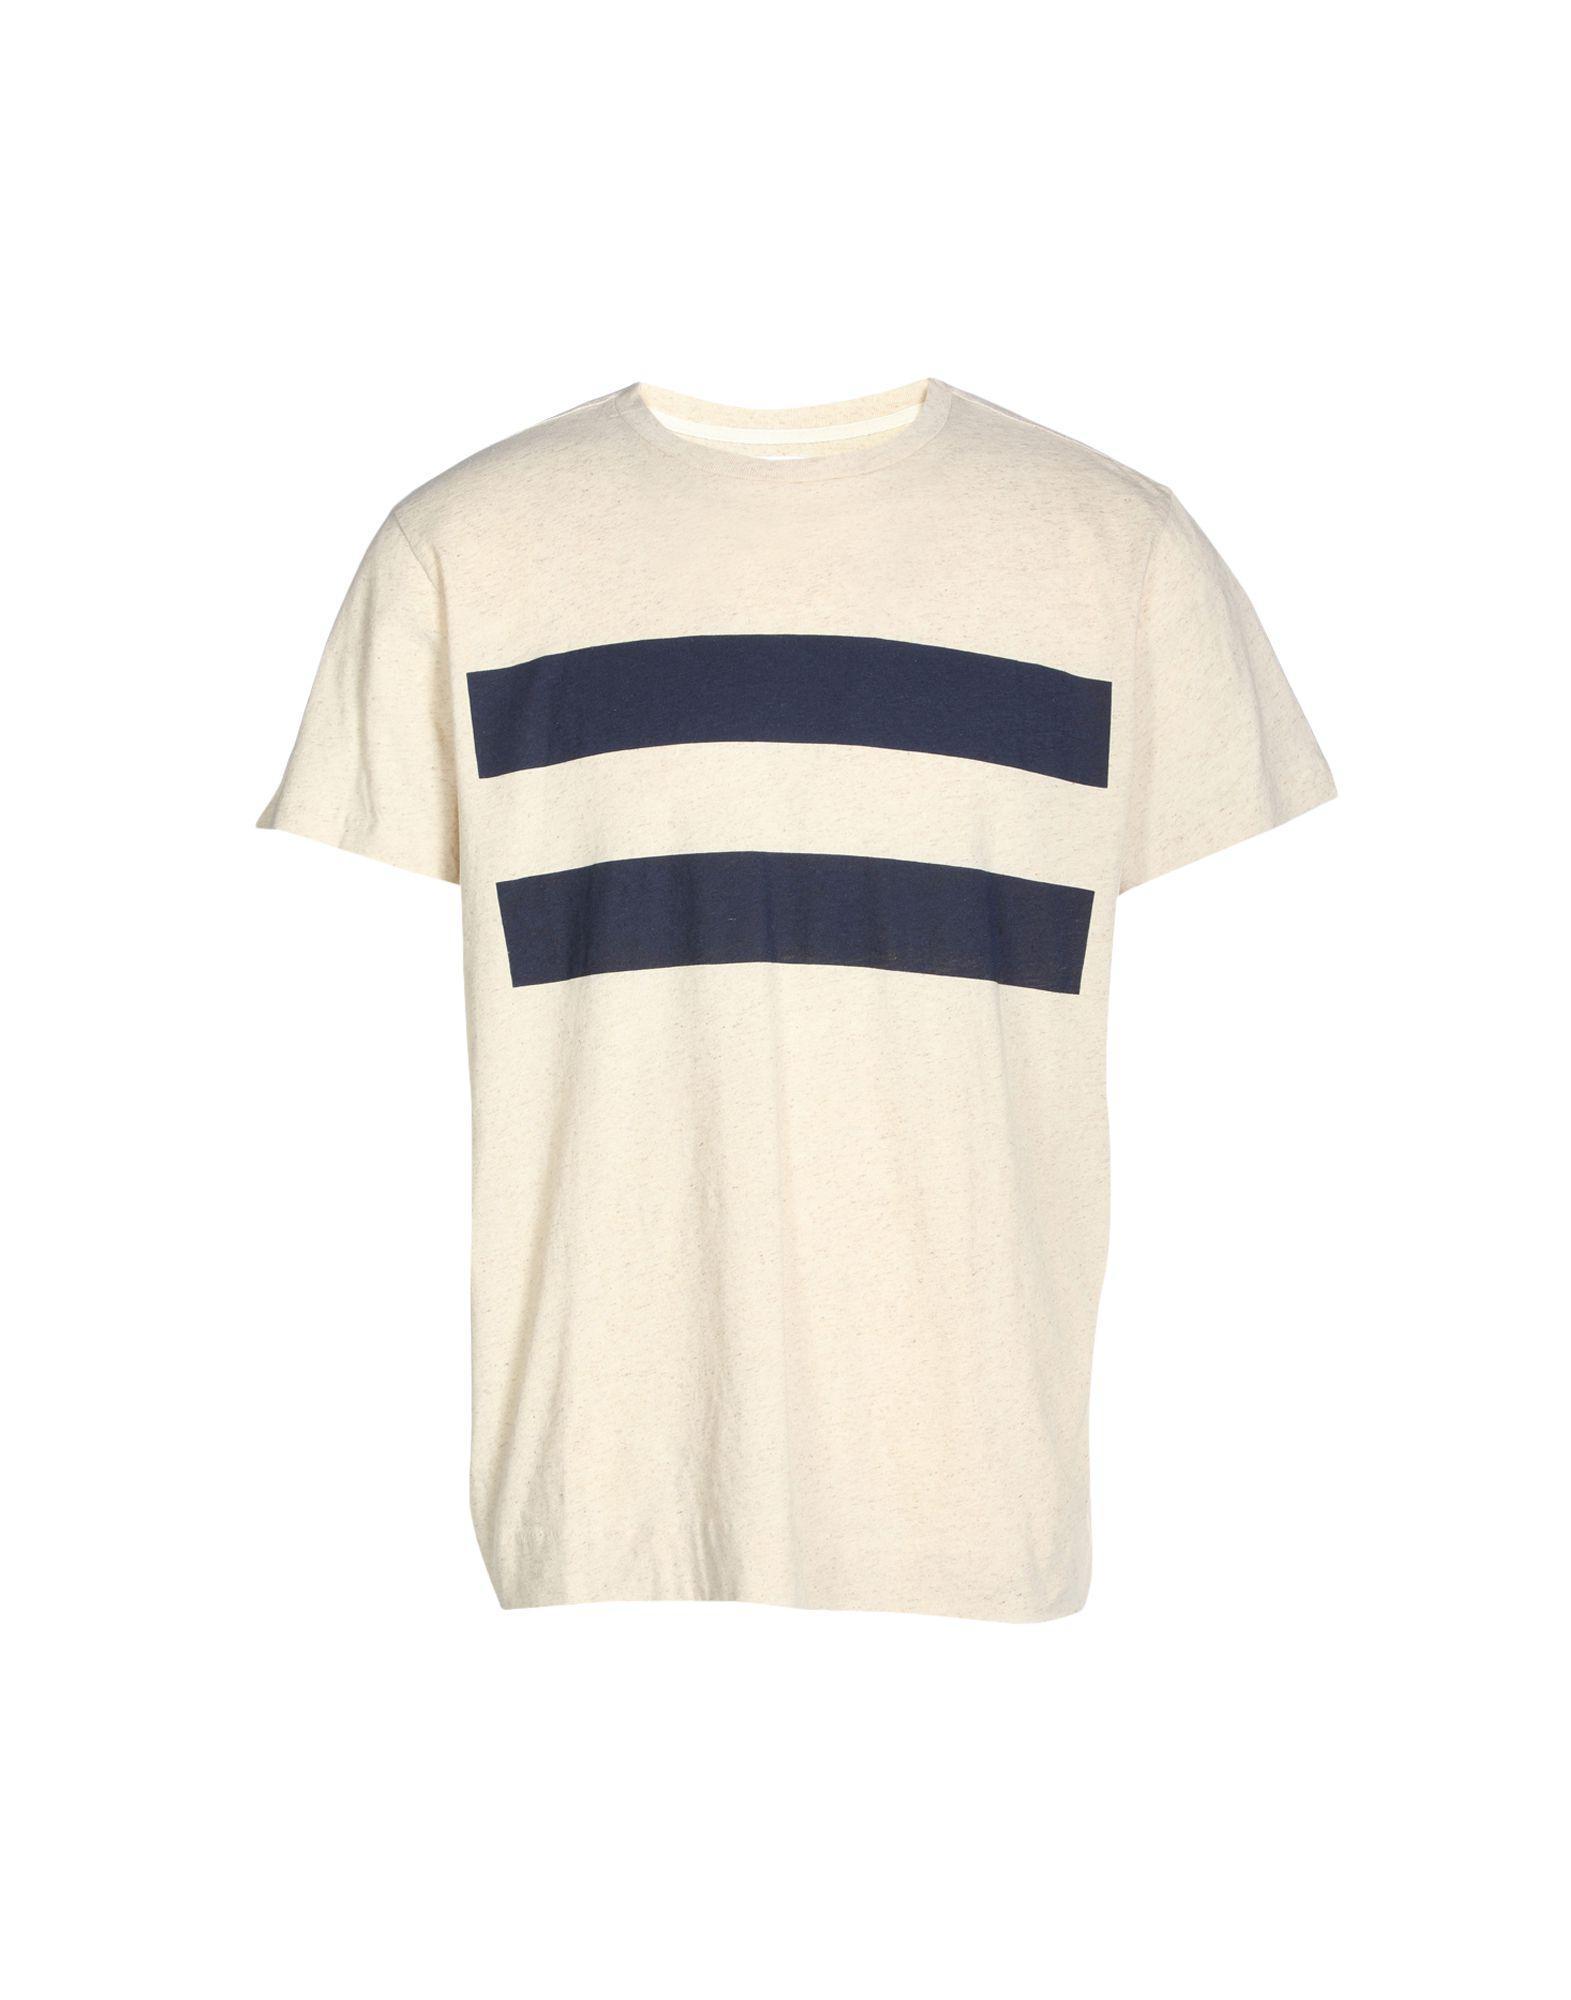 c5ef98e4560 Lyst - MHL by Margaret Howell Shirt in Natural for Men